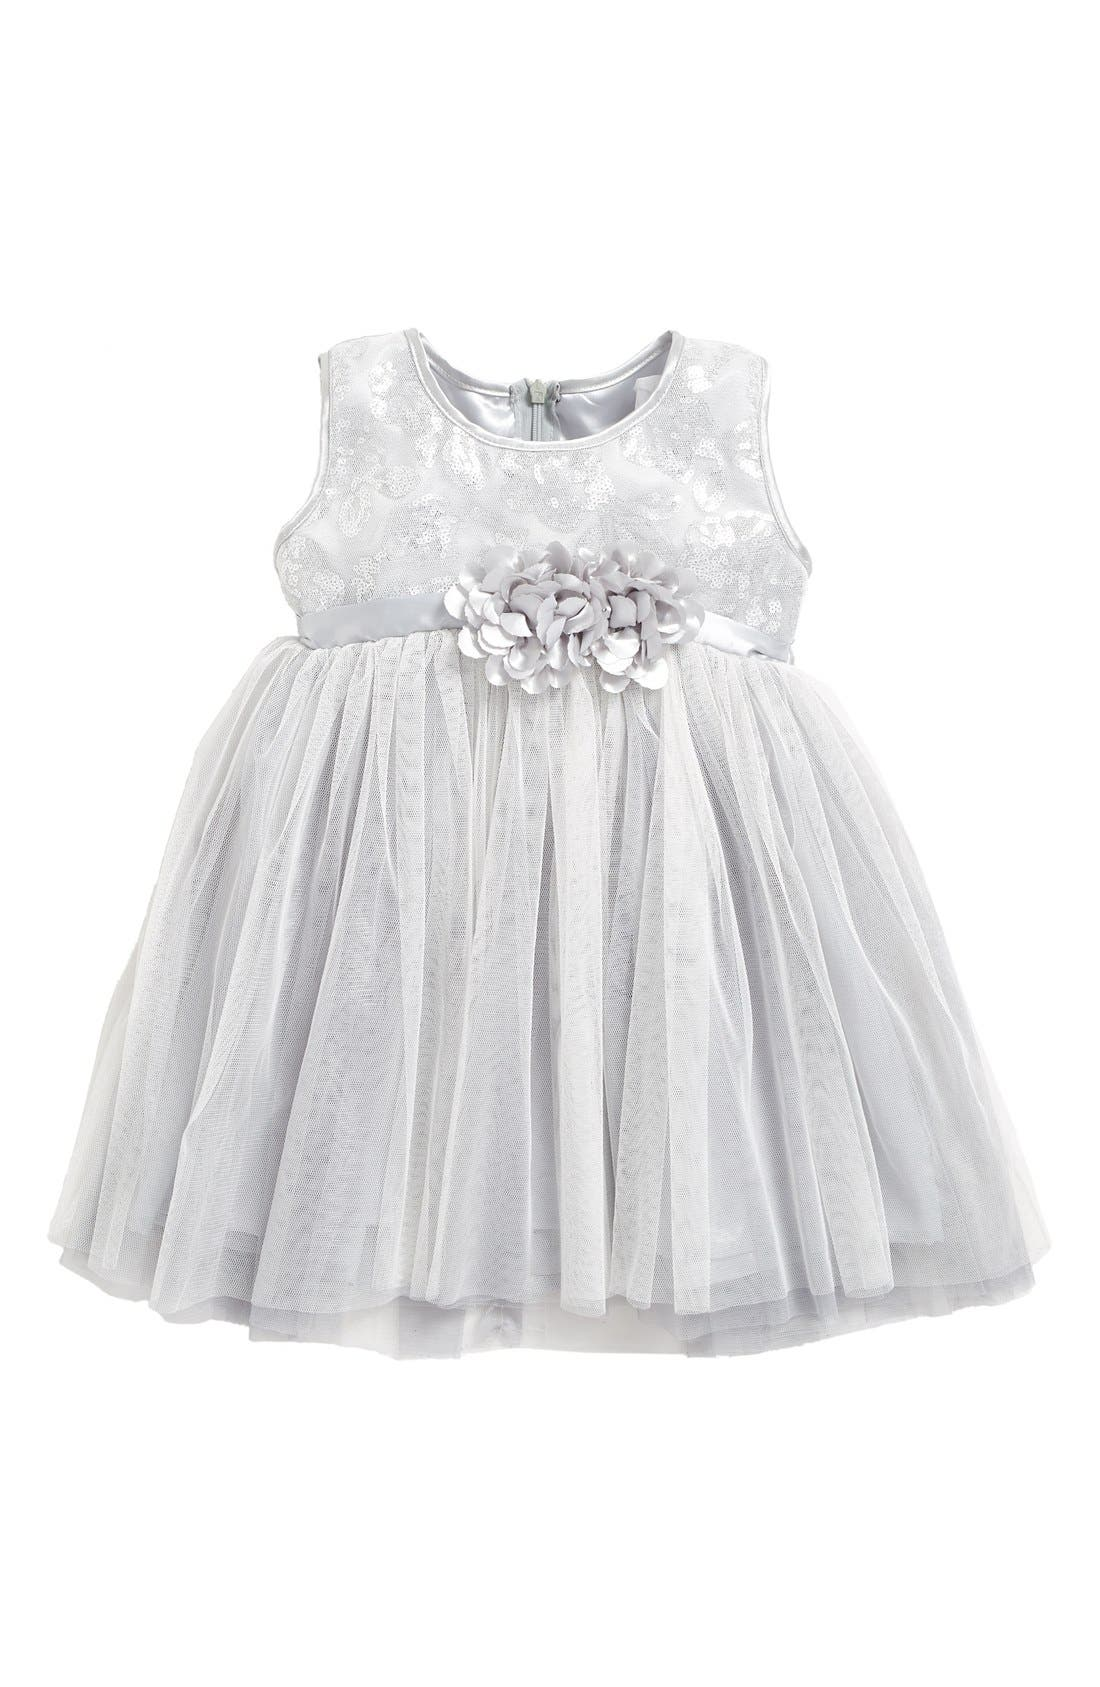 Empire Waist Tulle Dress,                         Main,                         color, 040